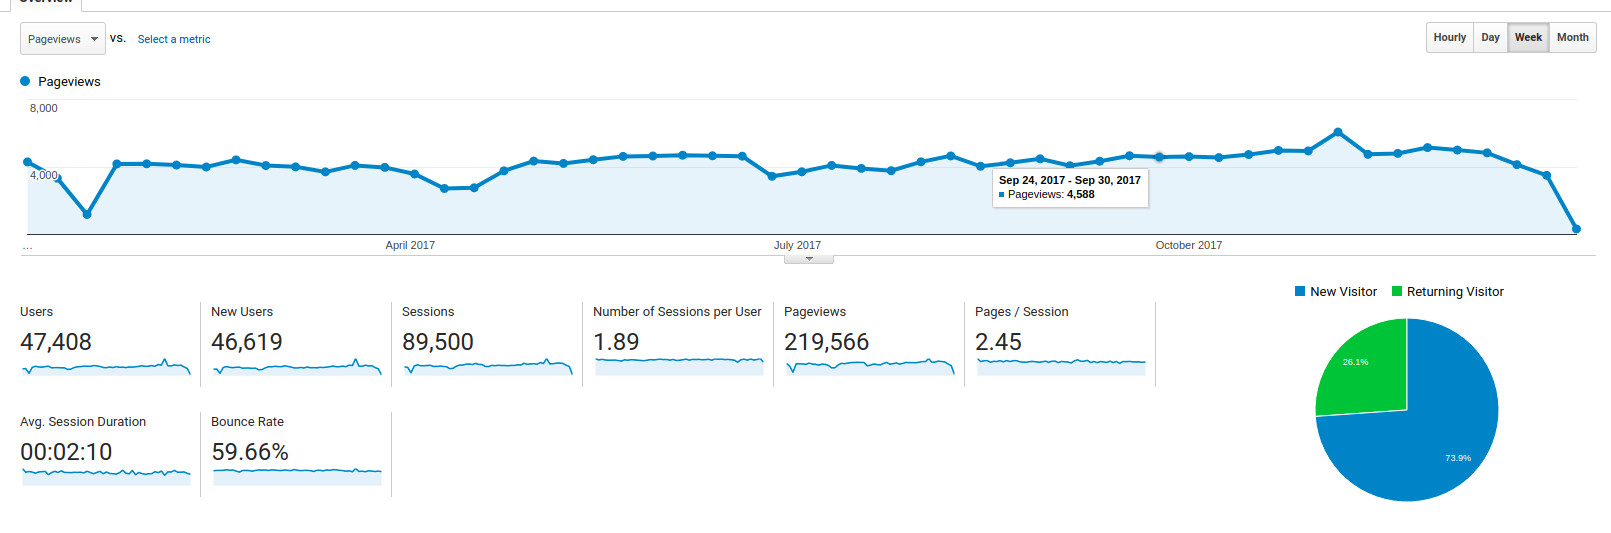 Screenshot of Google Analytics dashboard showing a variety of charts and metrics